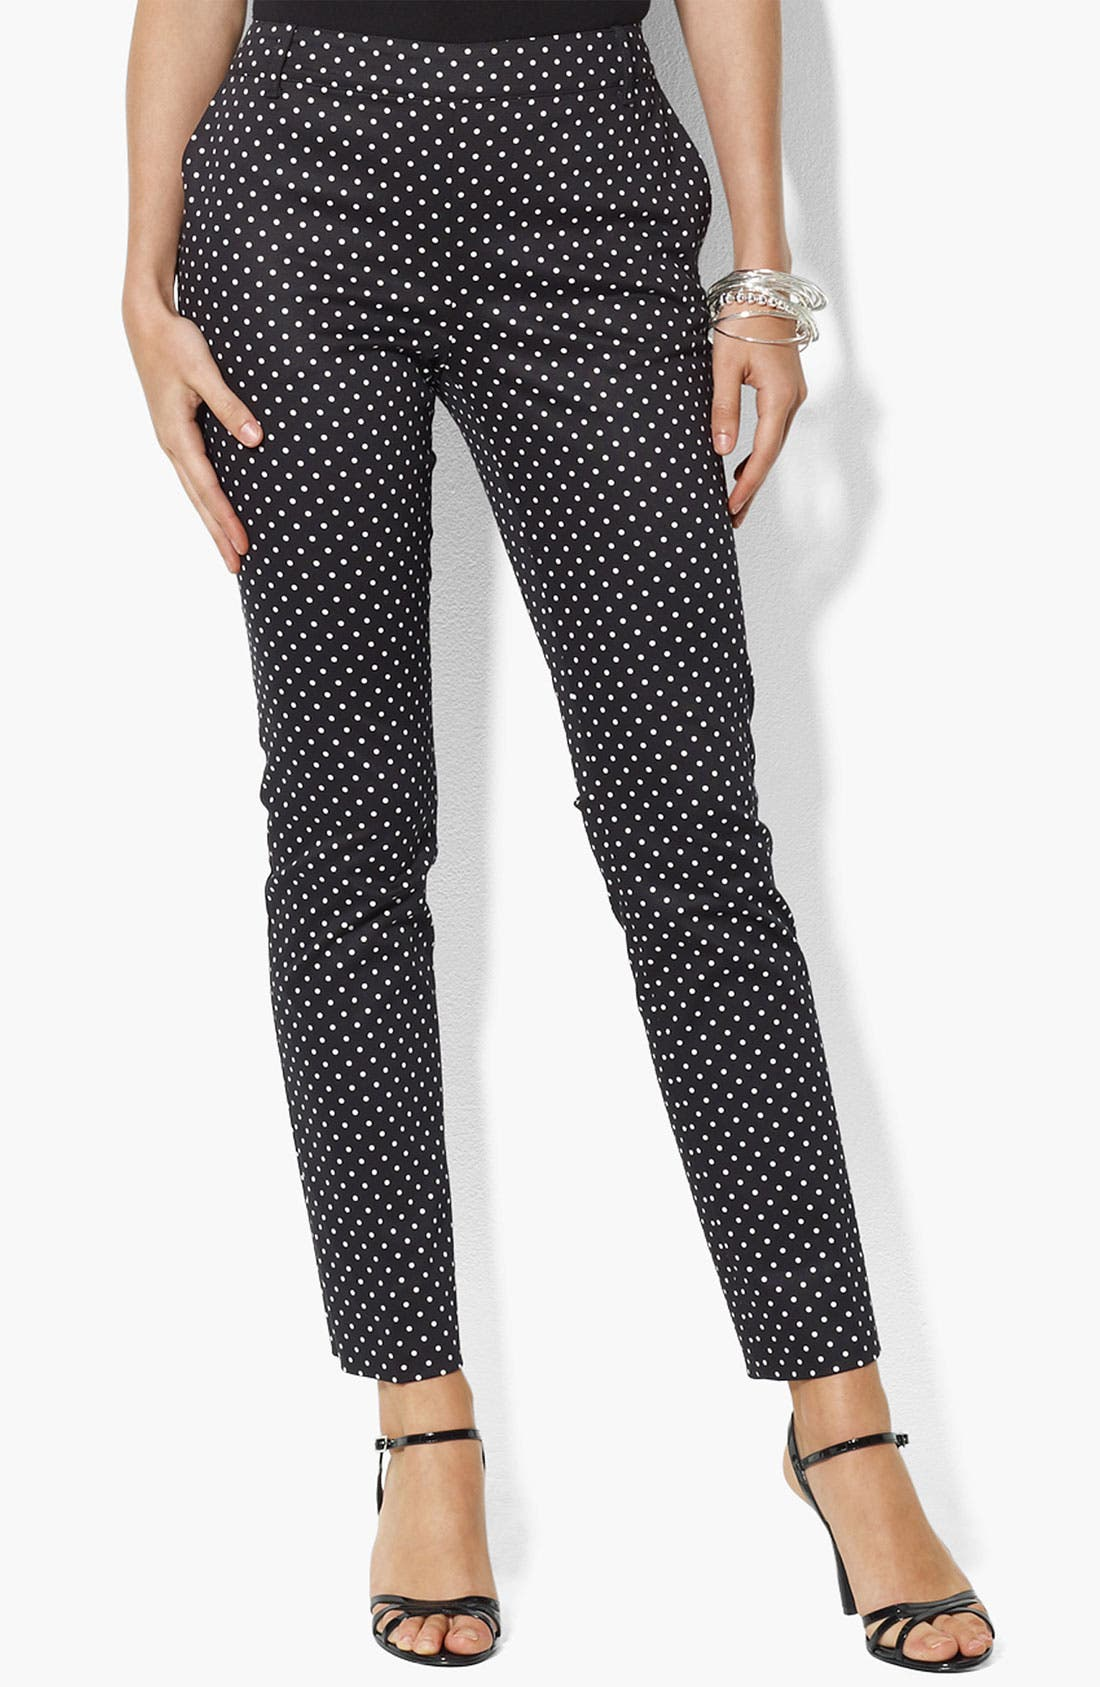 Alternate Image 1 Selected - Lauren Ralph Lauren Dot Print Ankle Pants